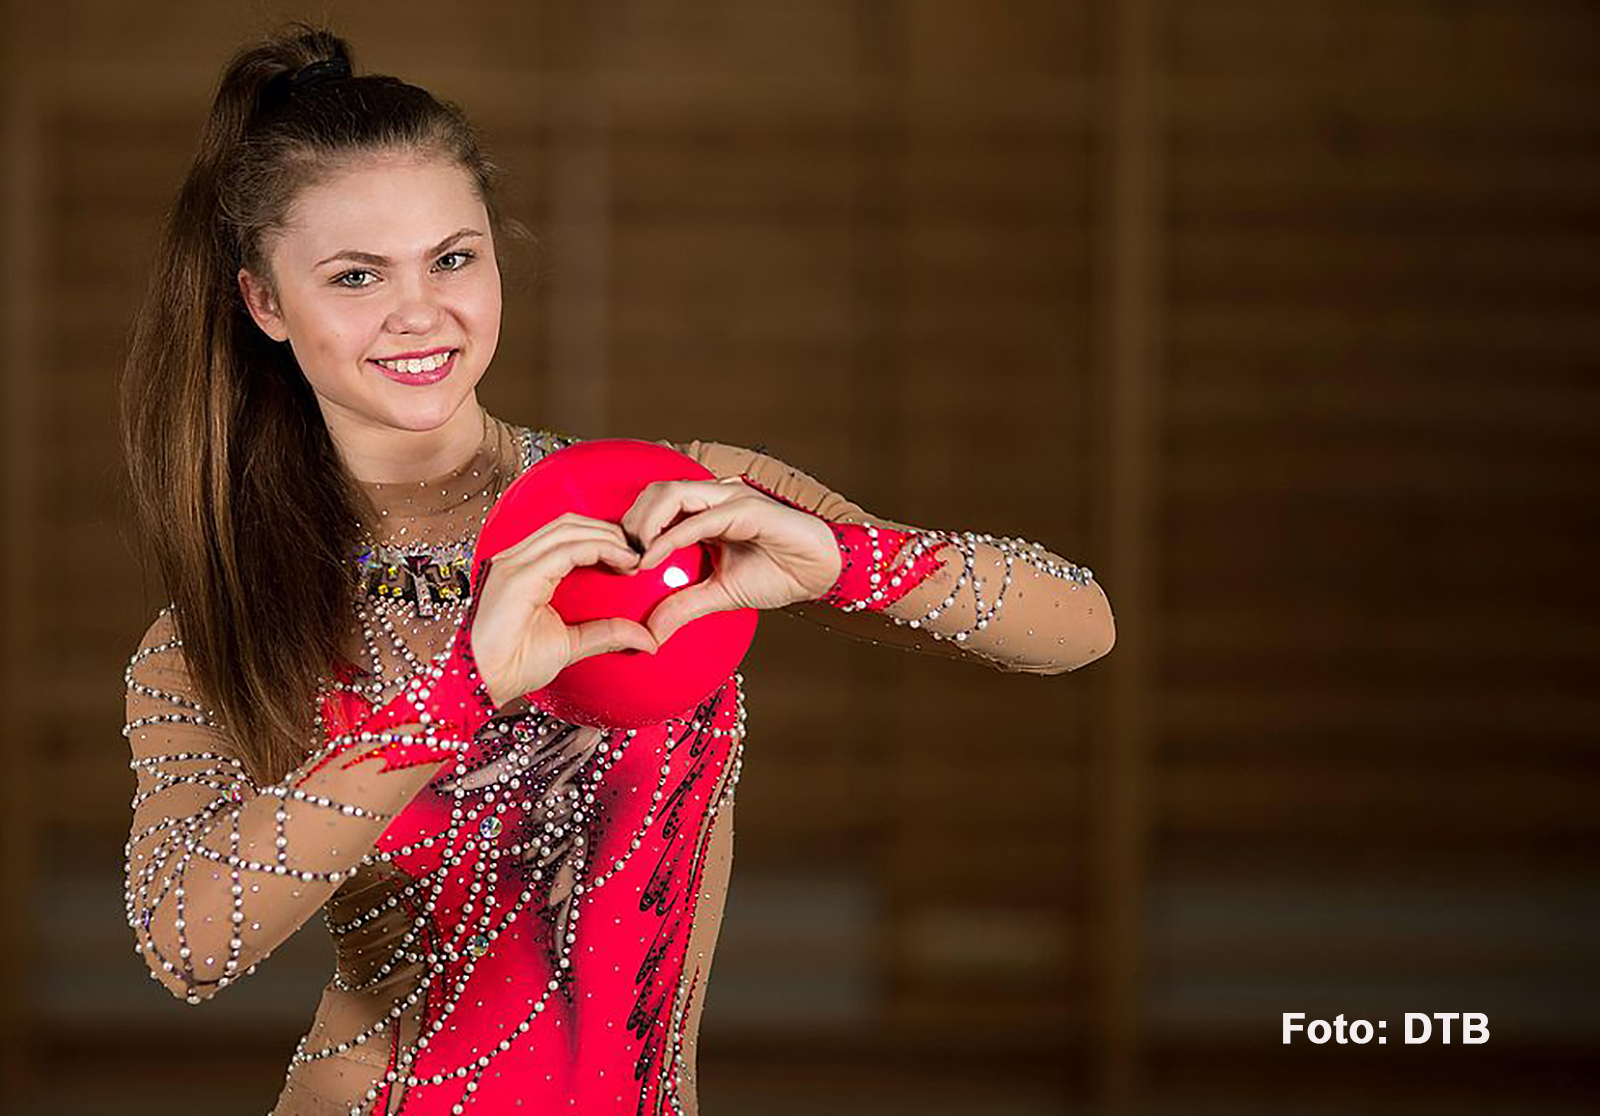 Daniela Huber kehrt nach Rehlingen zurück